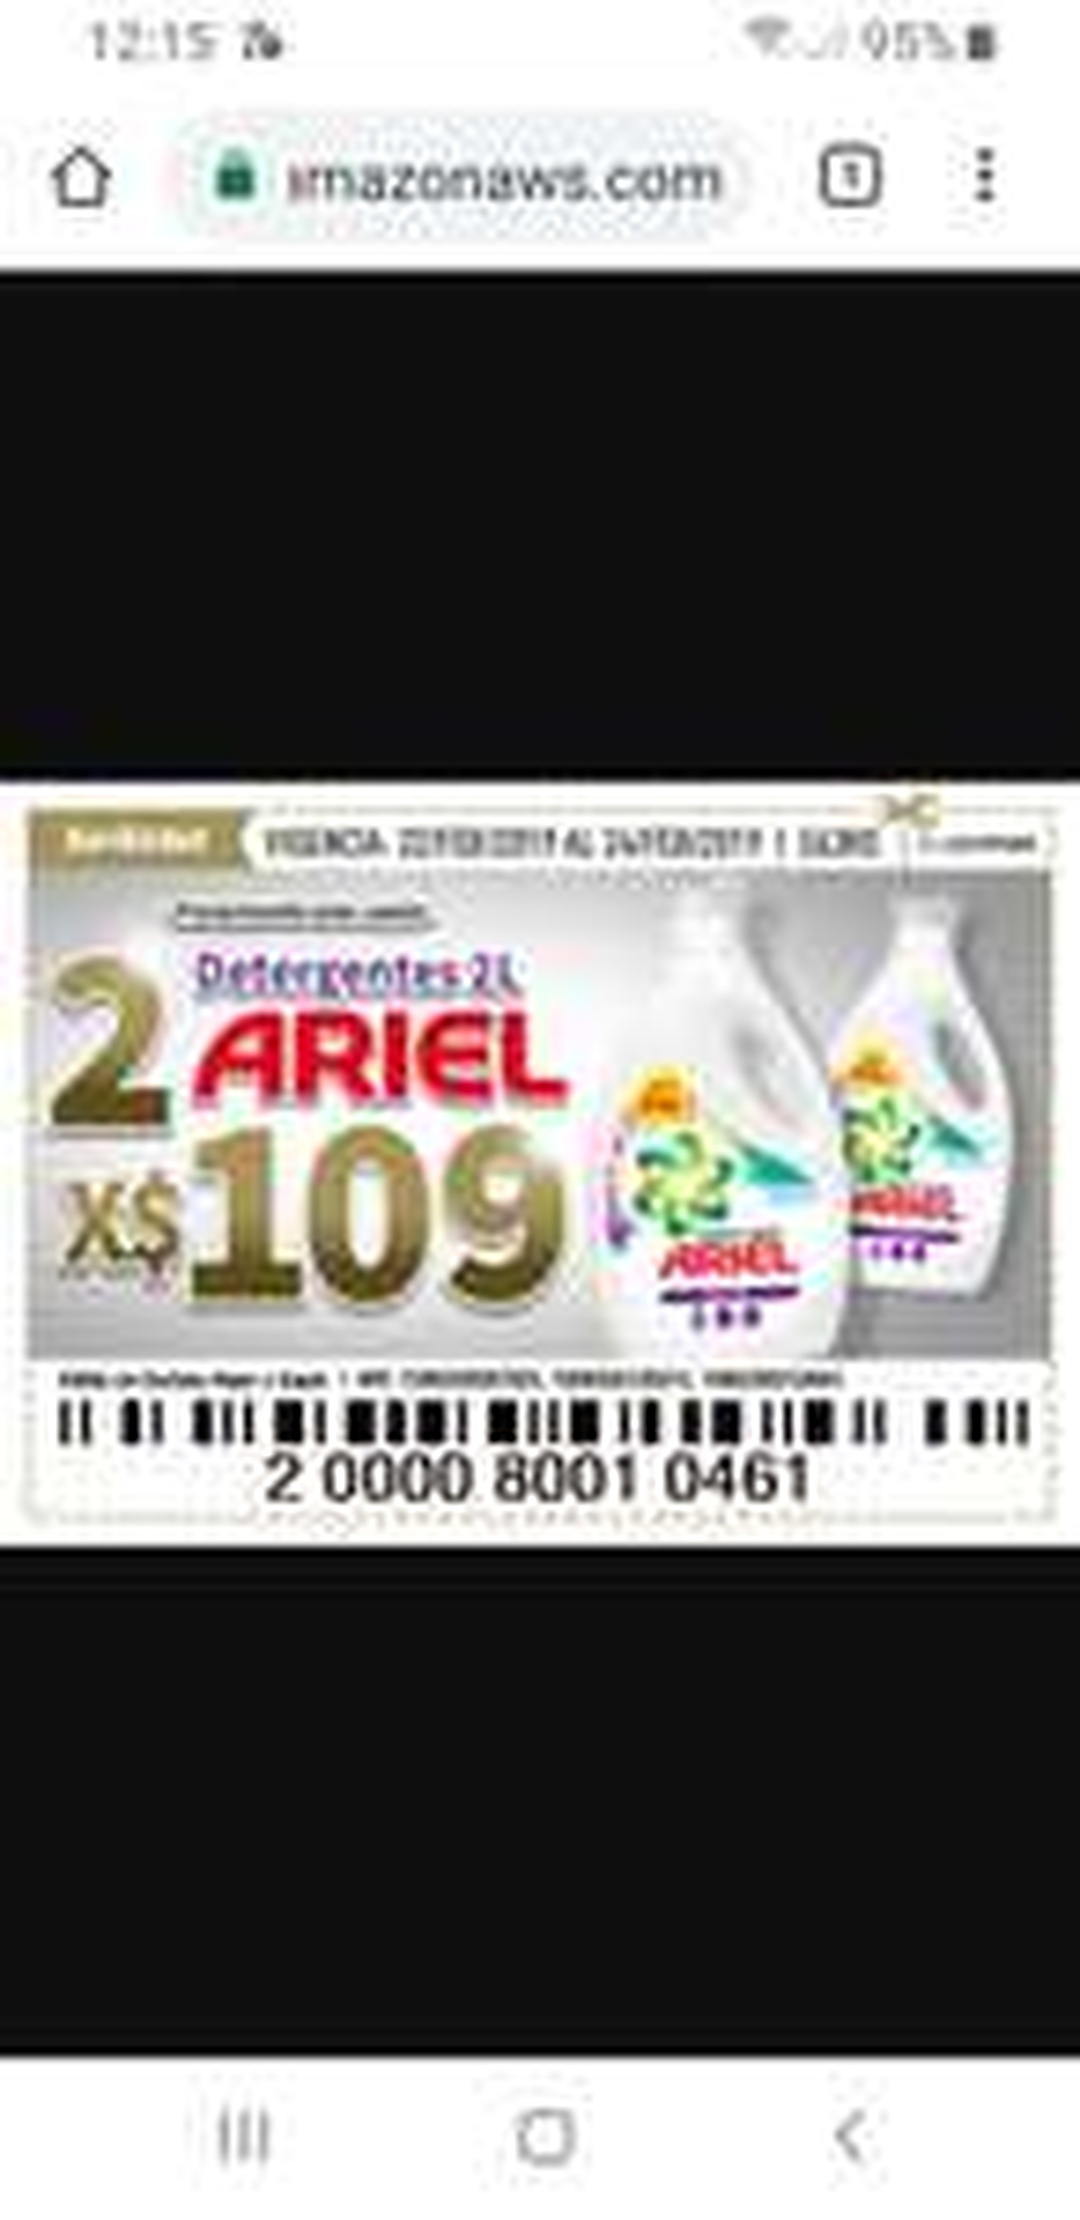 Soriana Híper: Soriticket 4 litros de jabón líquido Ariel x $109.00